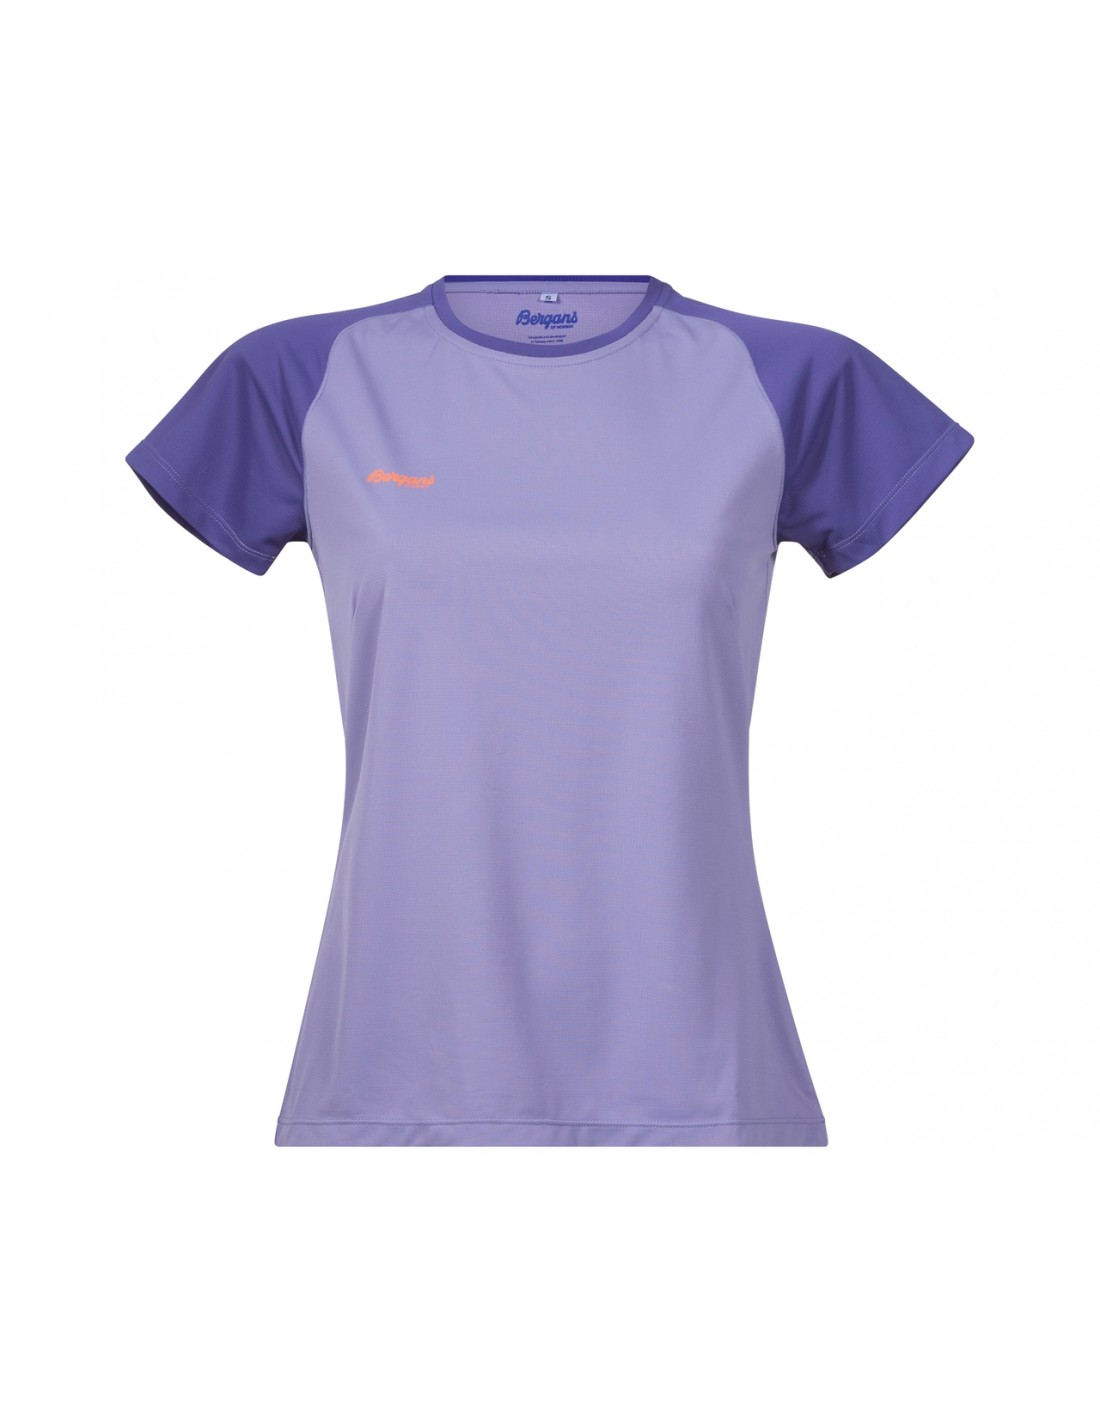 360cecac ... T-skjorter, Topper og Pique Bergans Slingsby Lady Tee 6527 ...